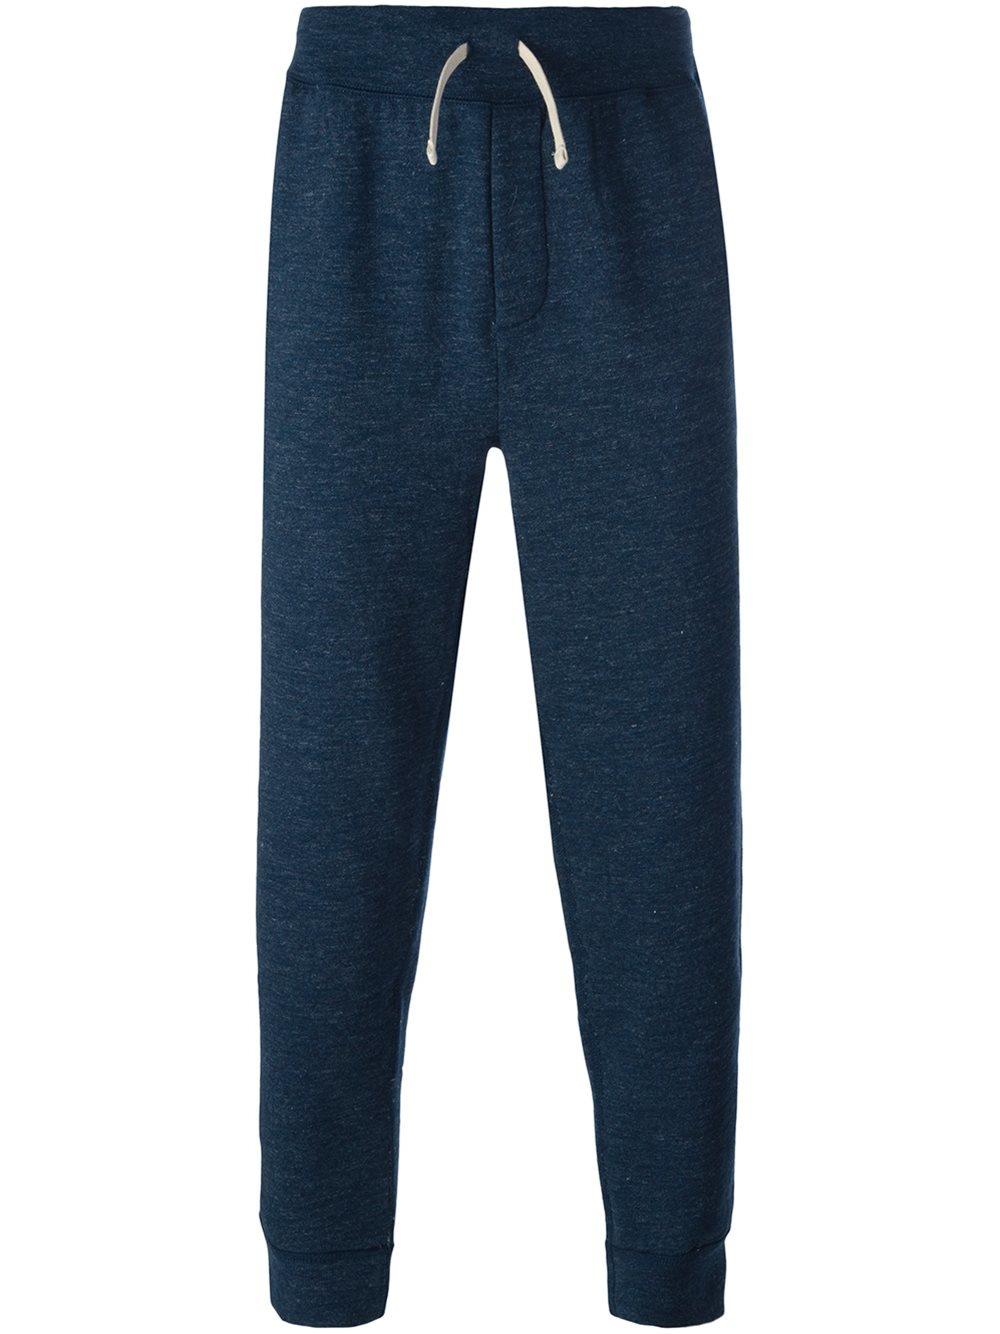 Polo Ralph Lauren Drawstring Track Pants in Blue for Men - Lyst ca0a7edb5f1